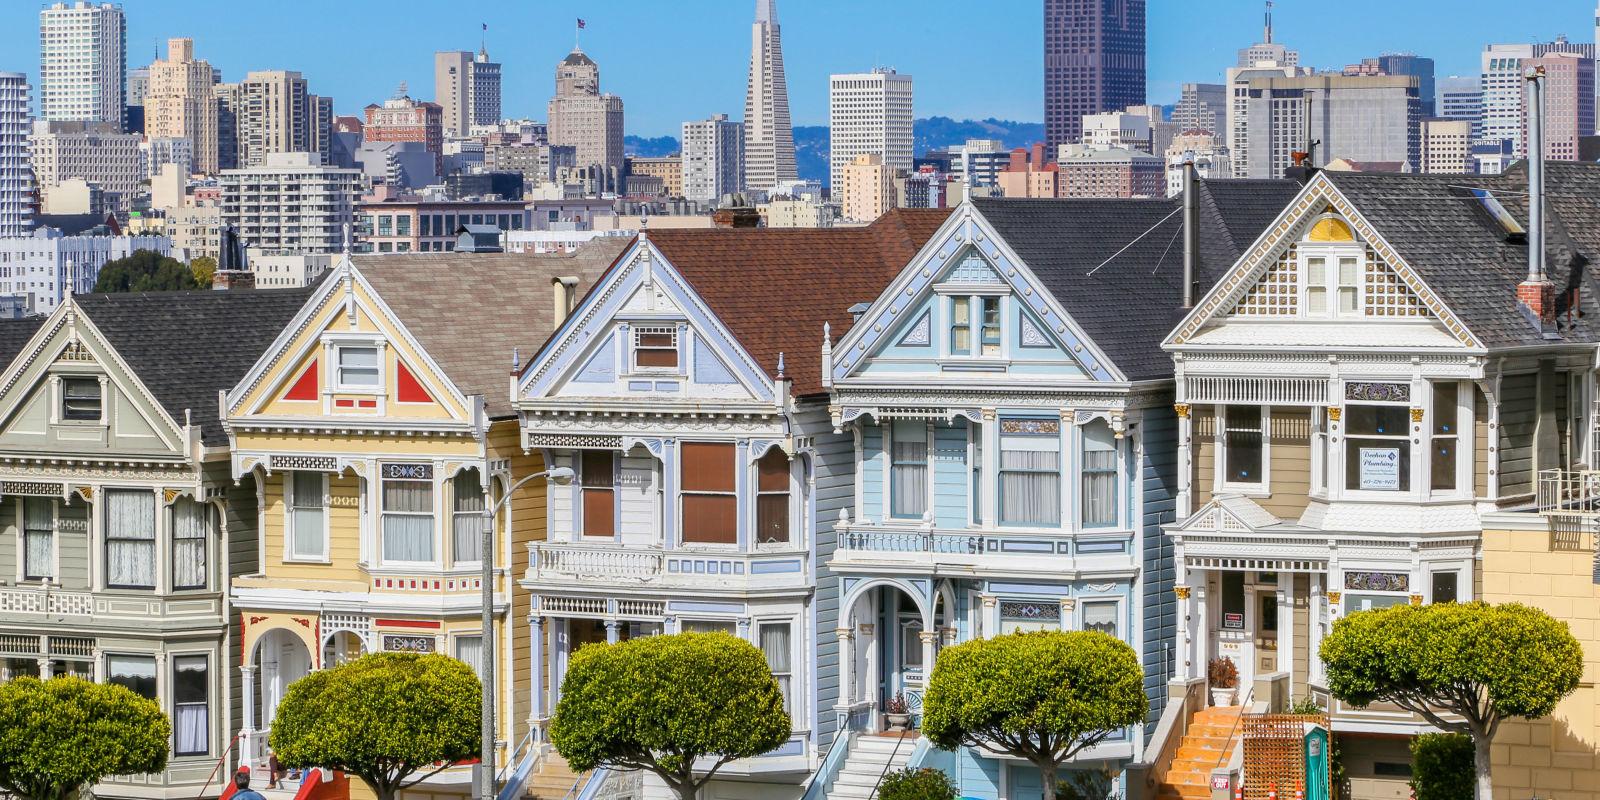 20 best celebrity homes of 2016 top celebrity real Celebrity real estate pictures